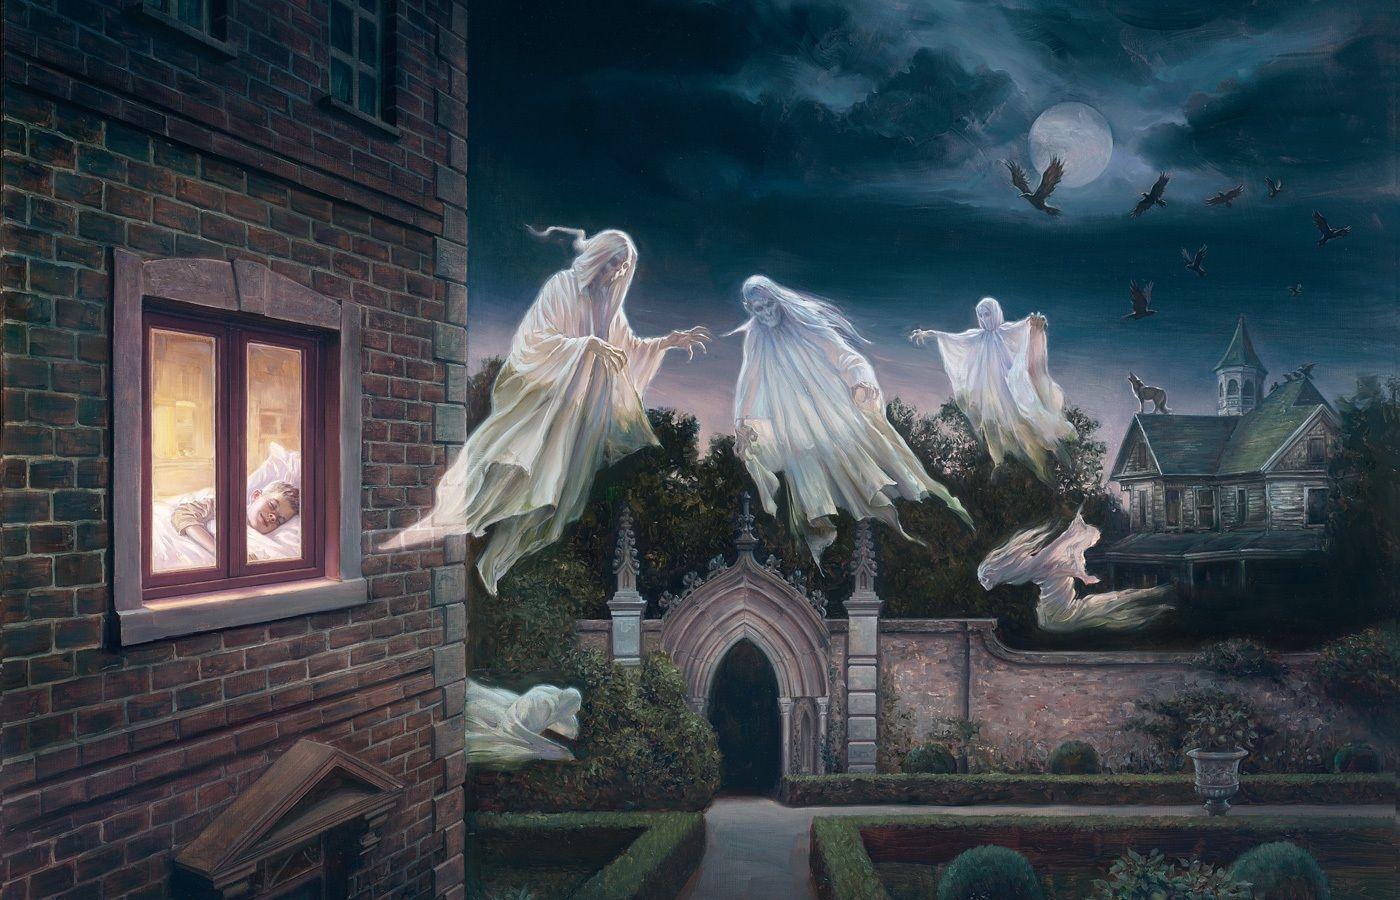 647 Halloween HD Wallpapers | Backgrounds - Wallpaper Abyss